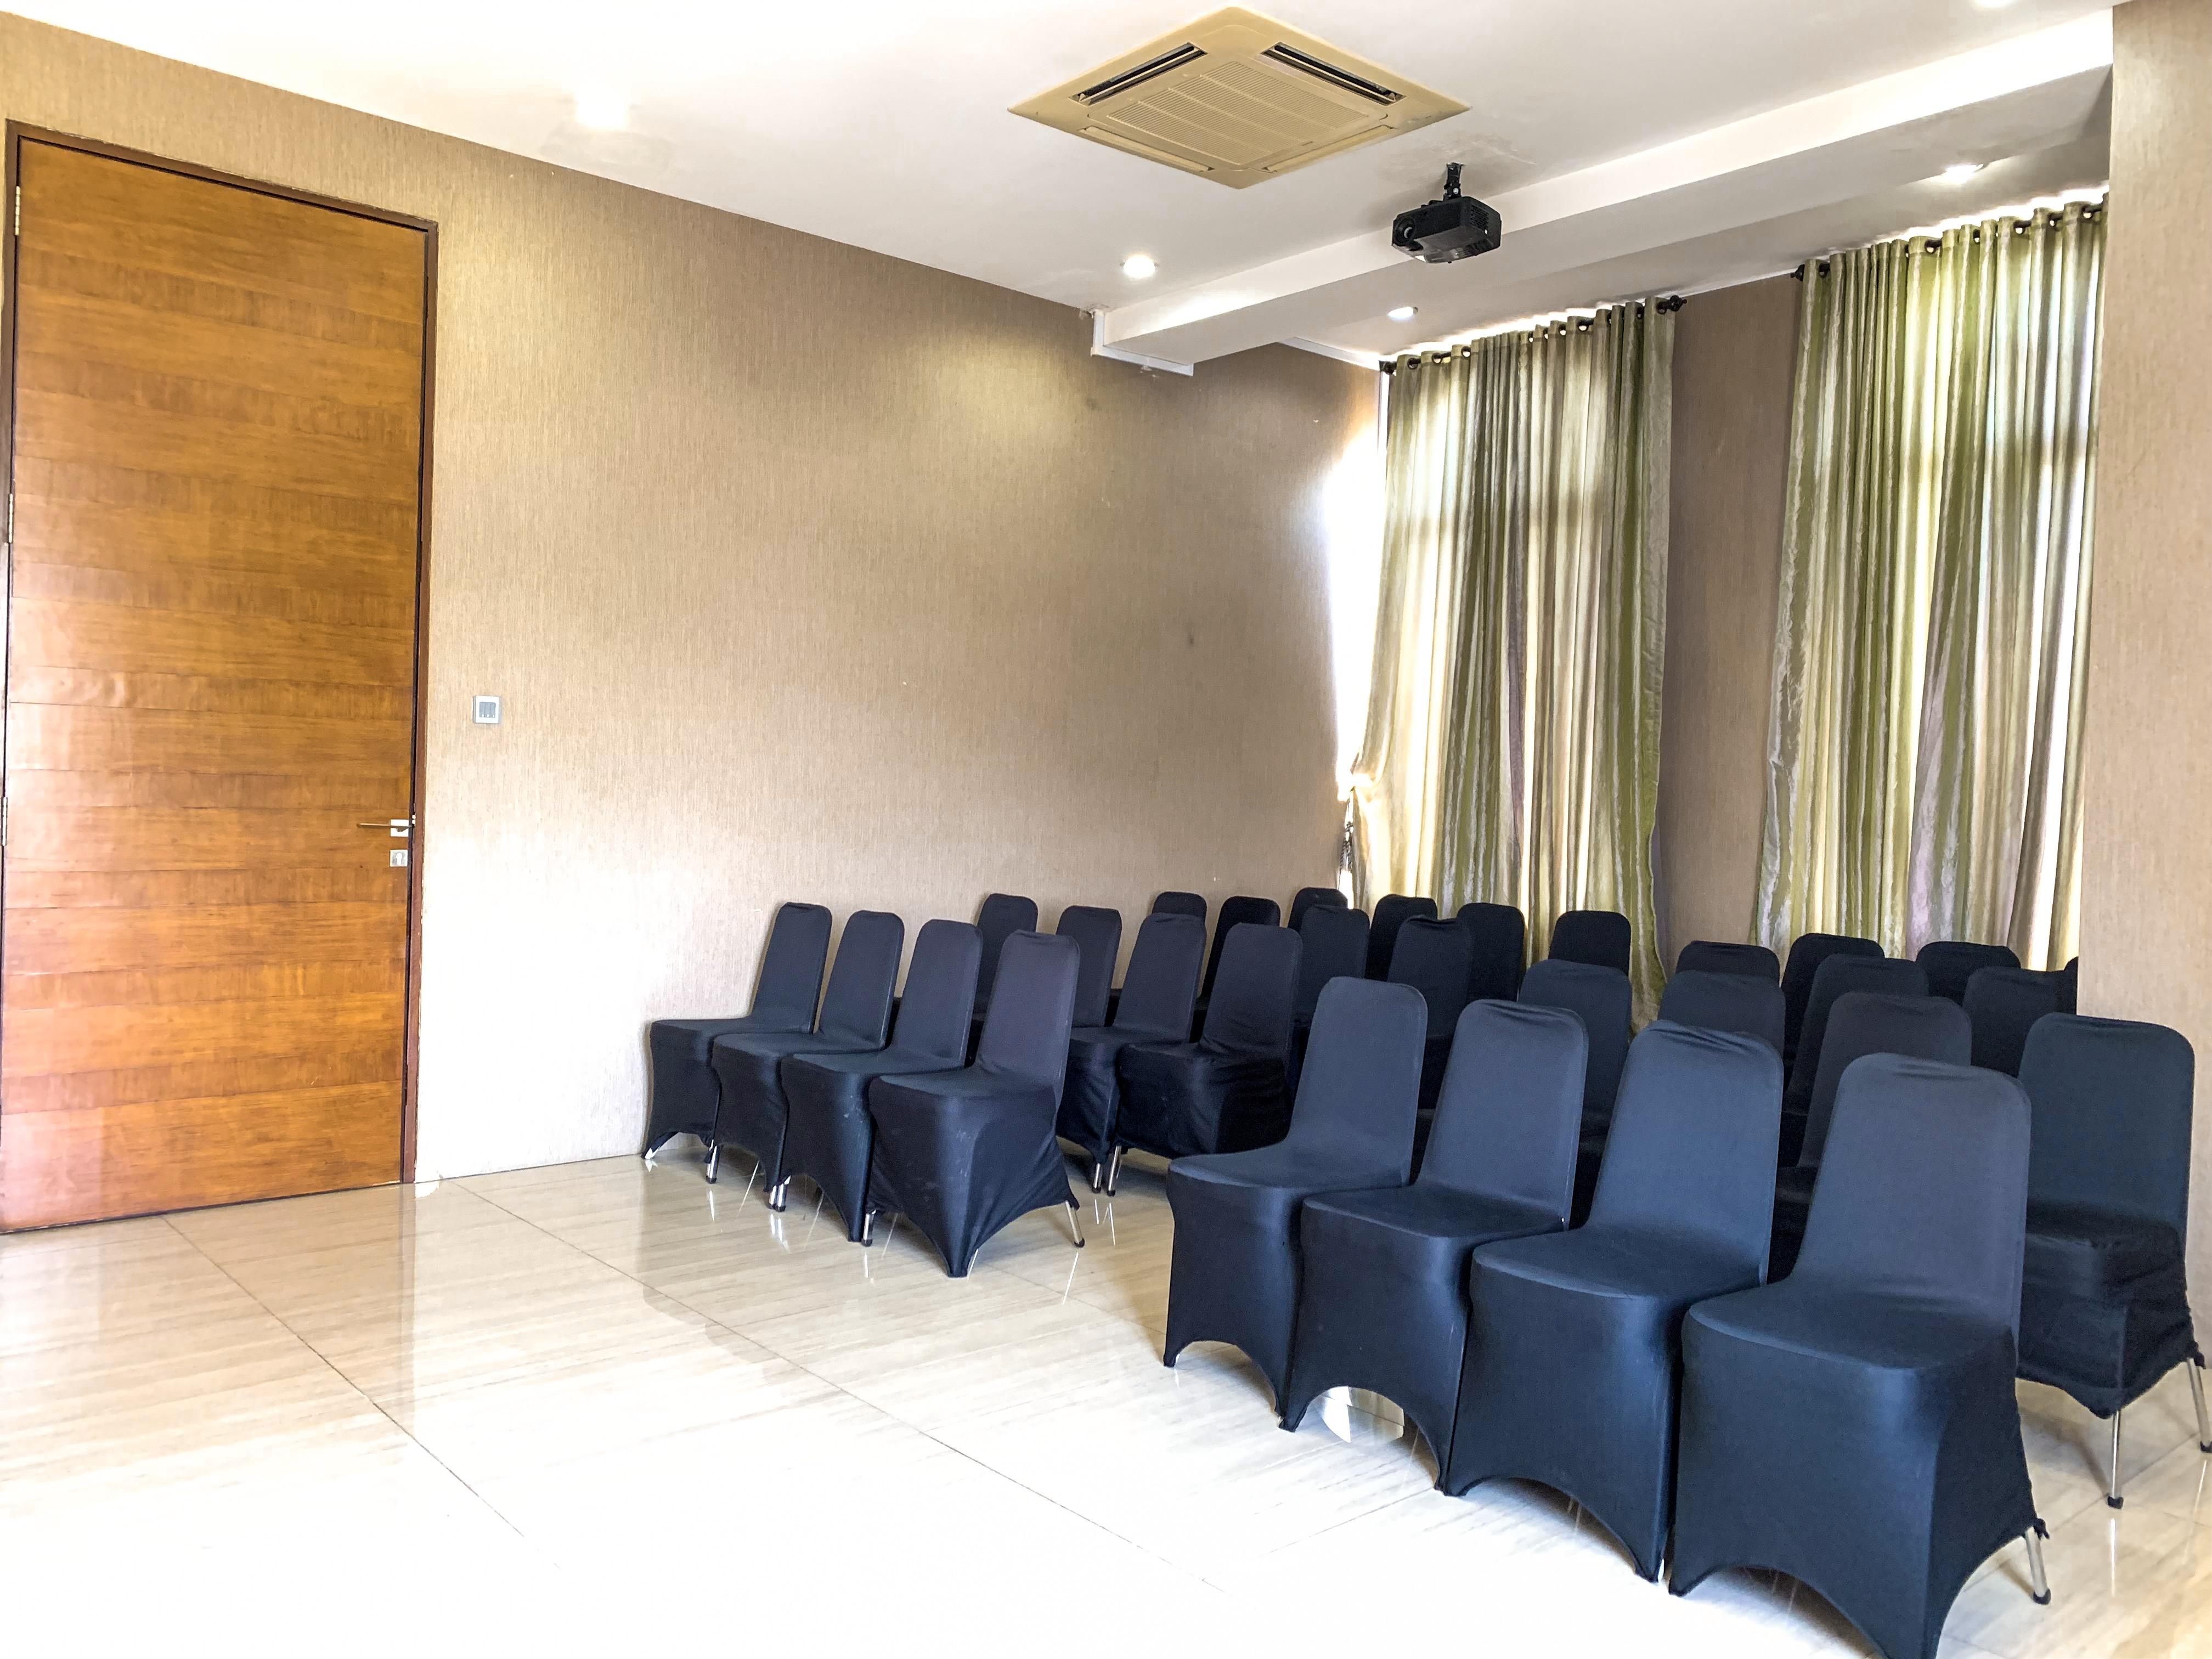 Meeting Room Facility